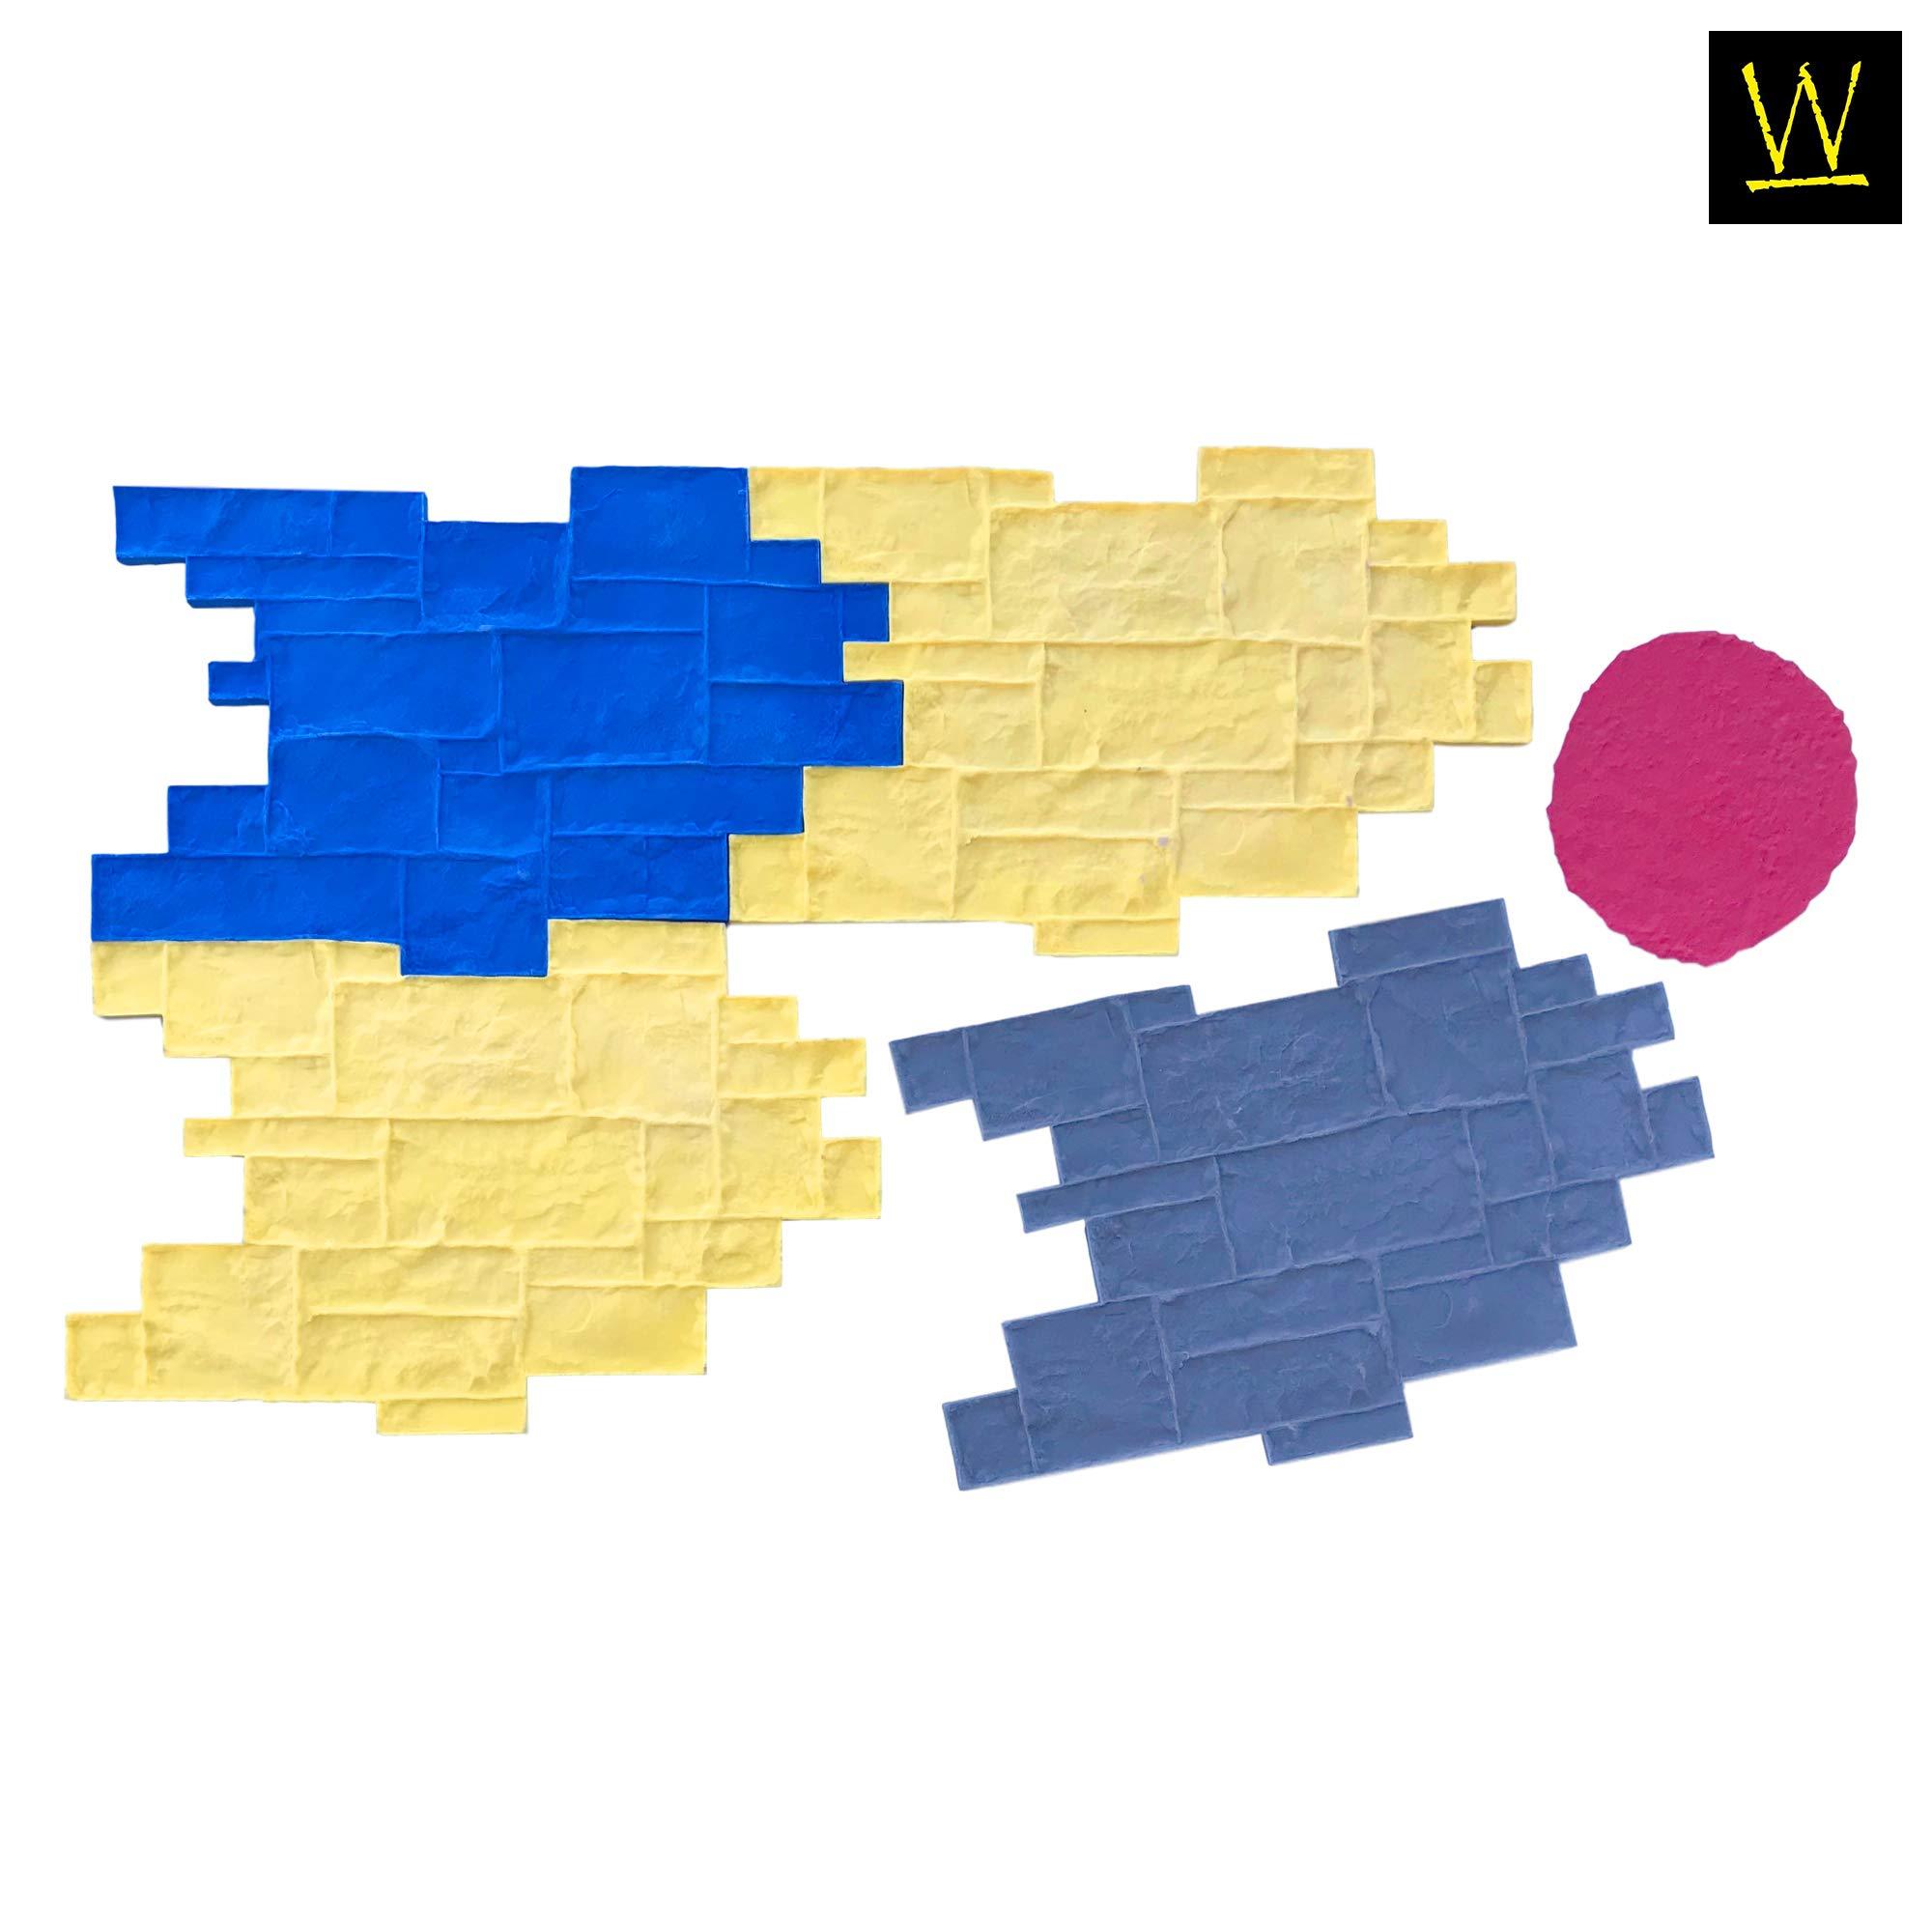 Medievil Cobble Concrete Stamp Set by Walttools | Decorative Random Cobblestone Pattern, Sturdy Polyurethane Texturing Mats, Realistic Detail (5 piece) by Walttools